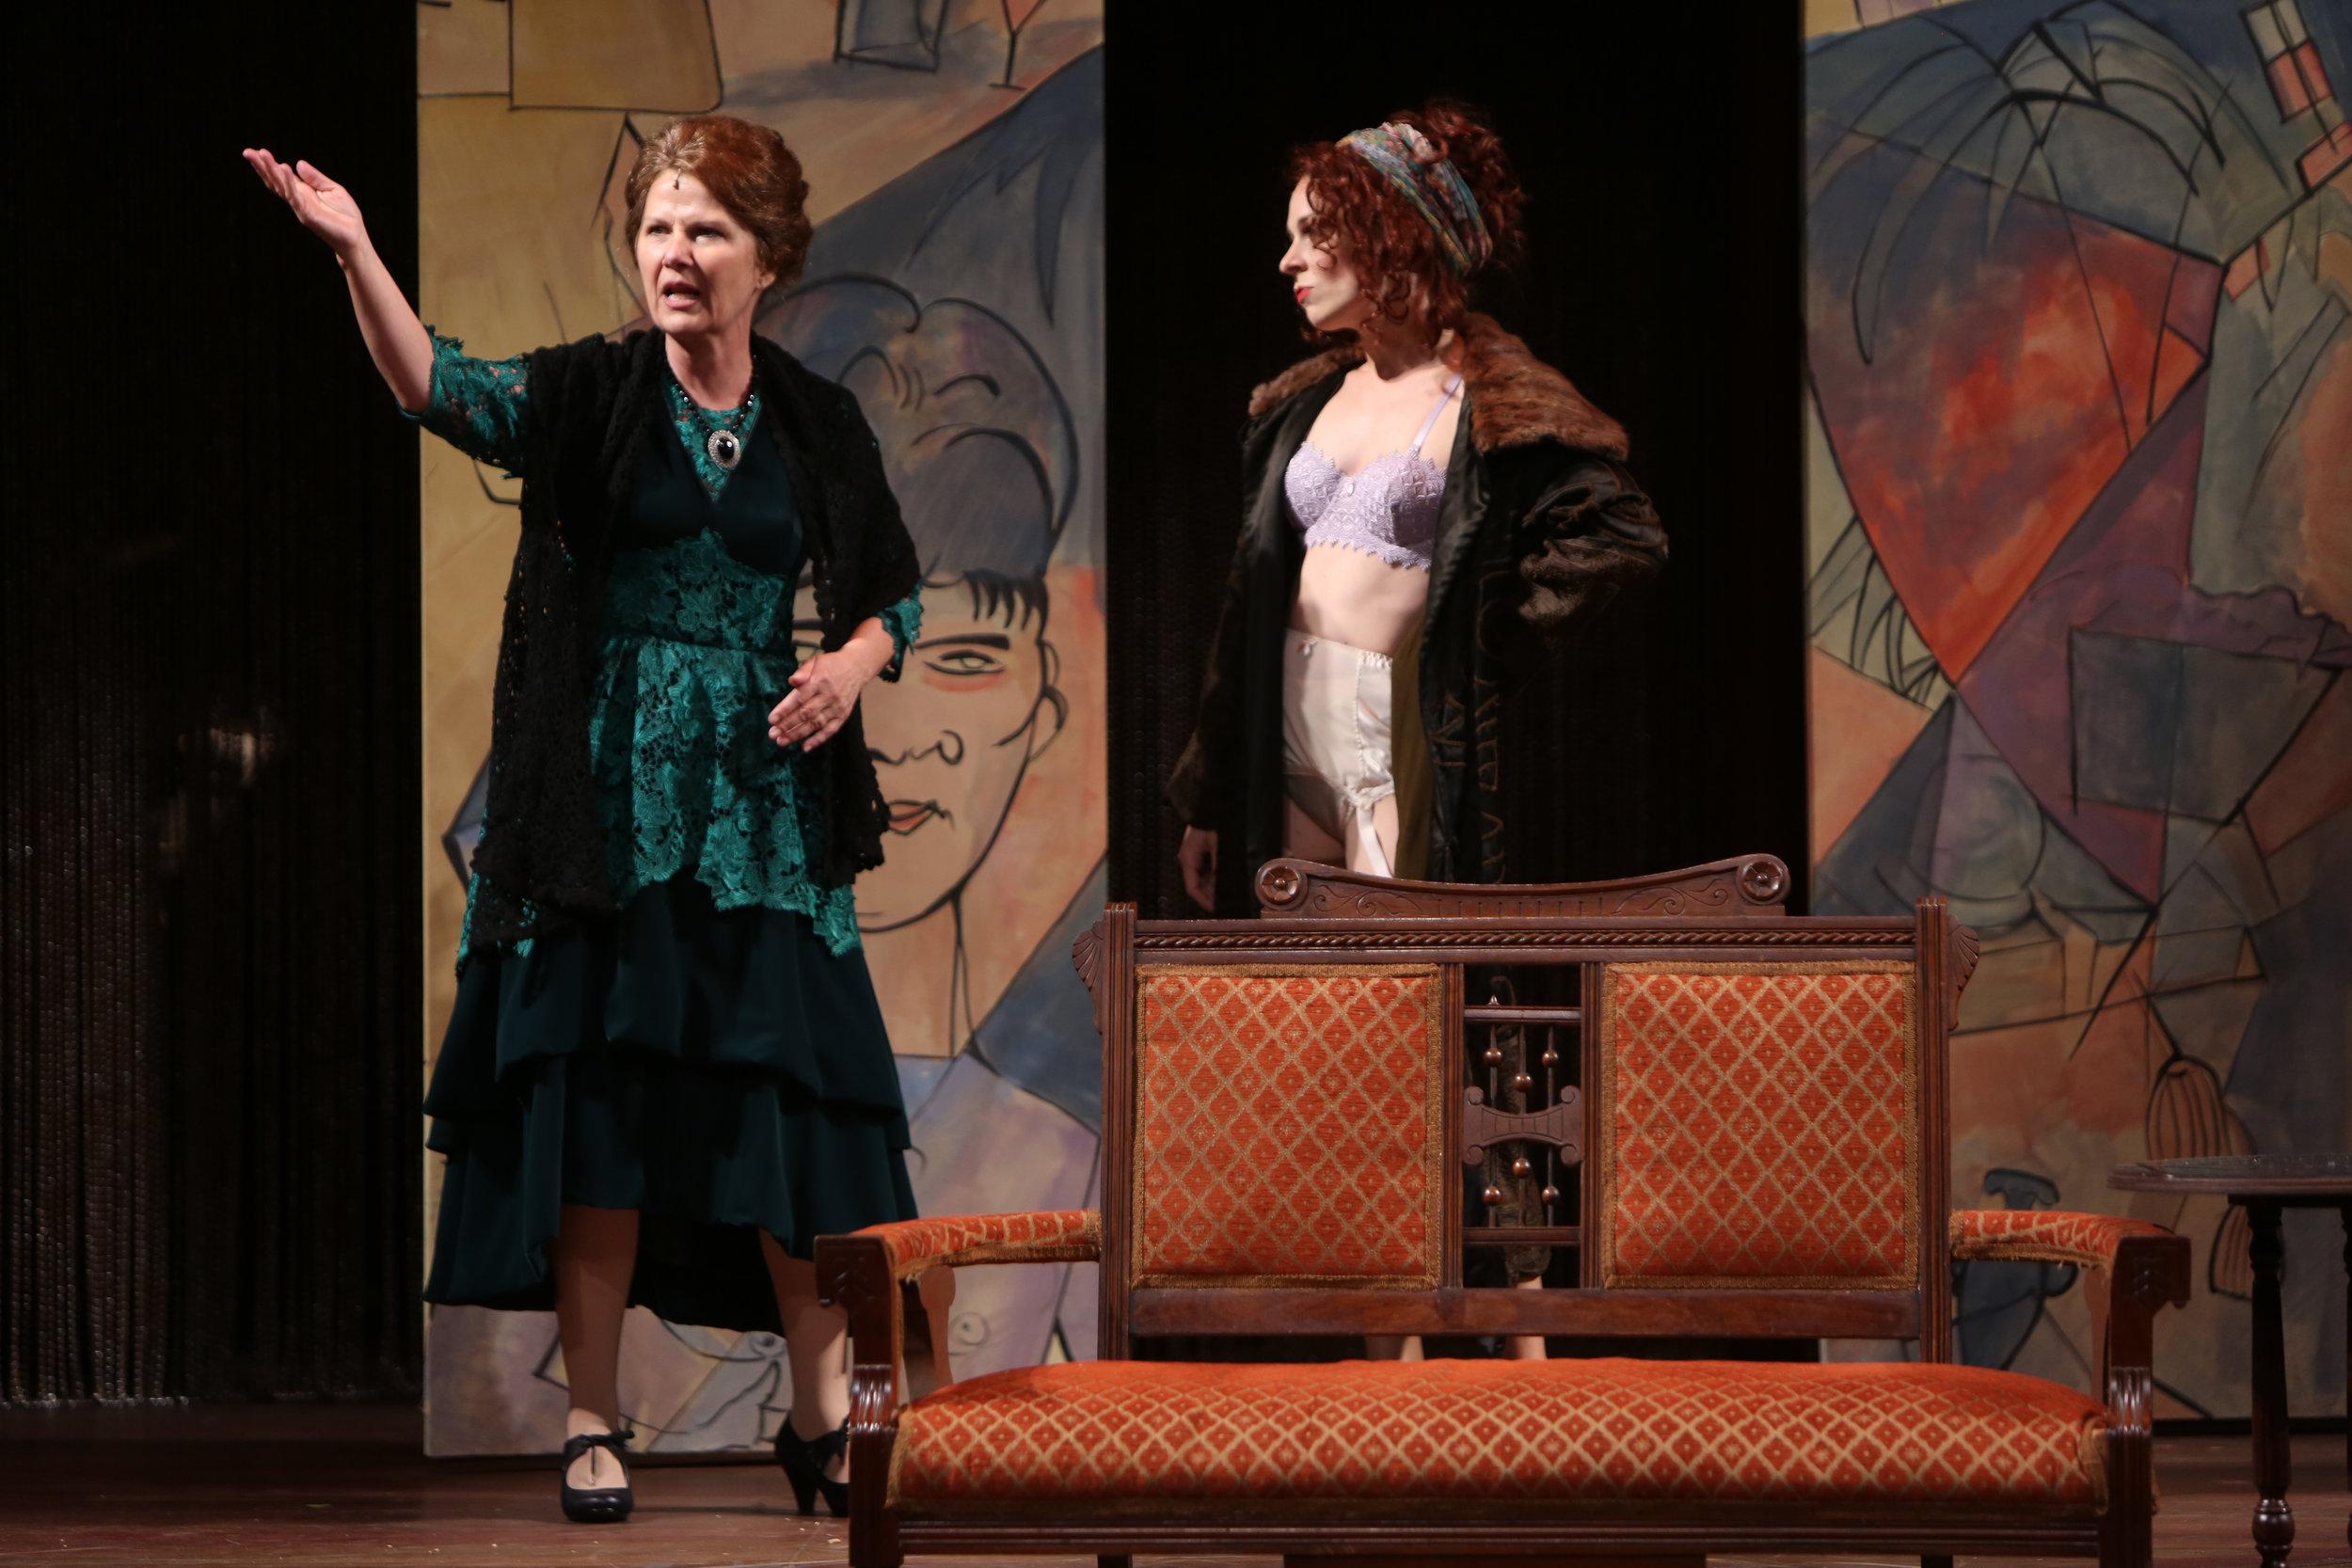 Kost and Frau Schneider (Mary Gordon Murray).